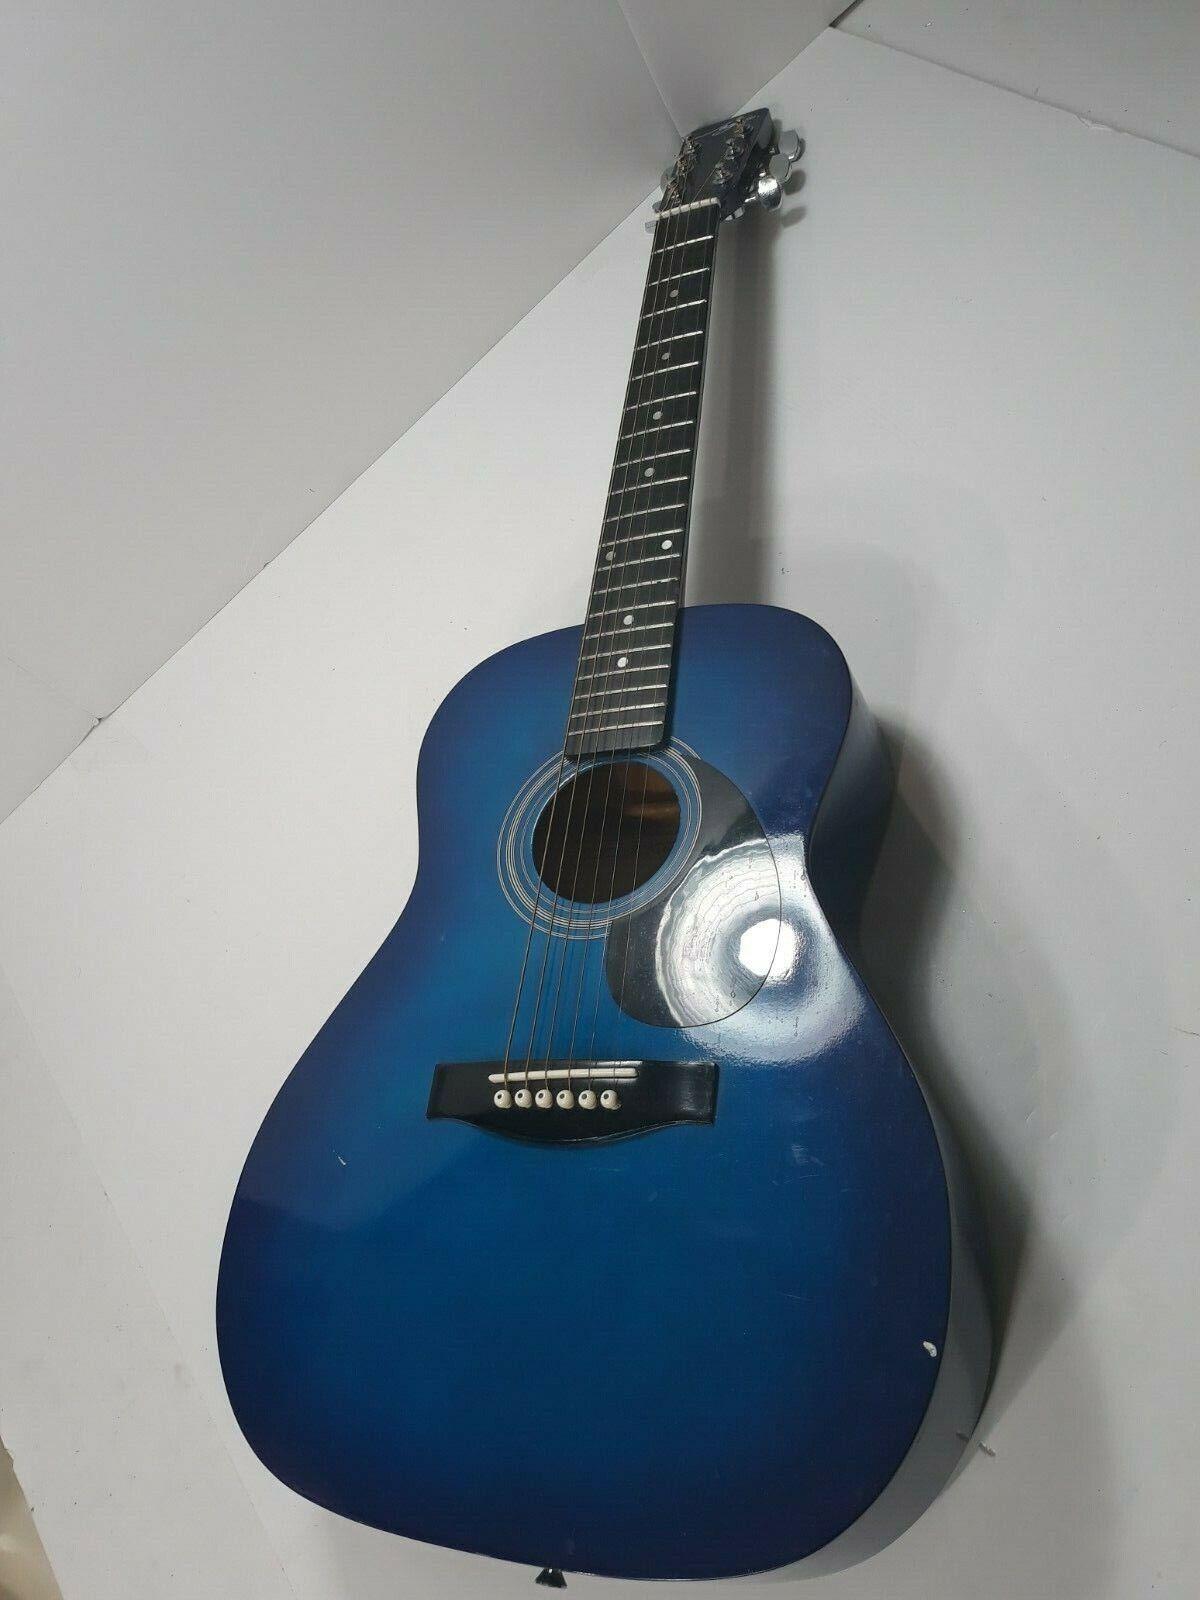 Jay Jr. Voll Größe Akustische Gitarre Glanz Blau Jay-Jr   Tbl